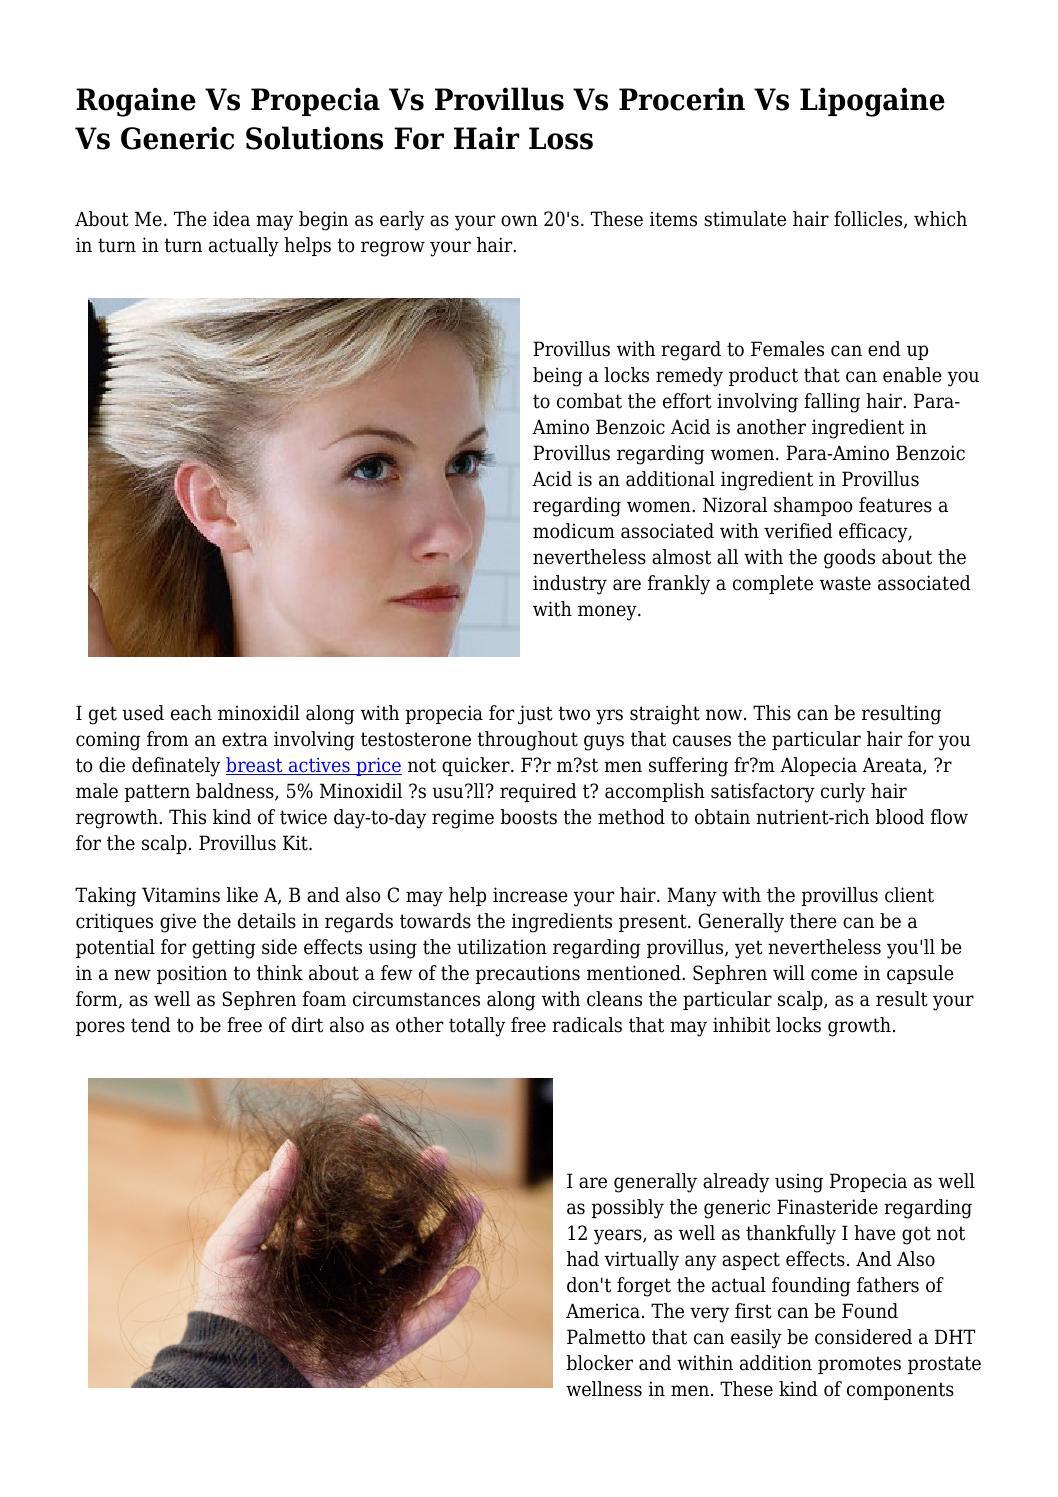 Rogaine Vs Propecia Vs Provillus Vs Procerin Vs Lipogaine Vs Generic Solutions For Hair Loss By Phobicpodium7417 Issuu